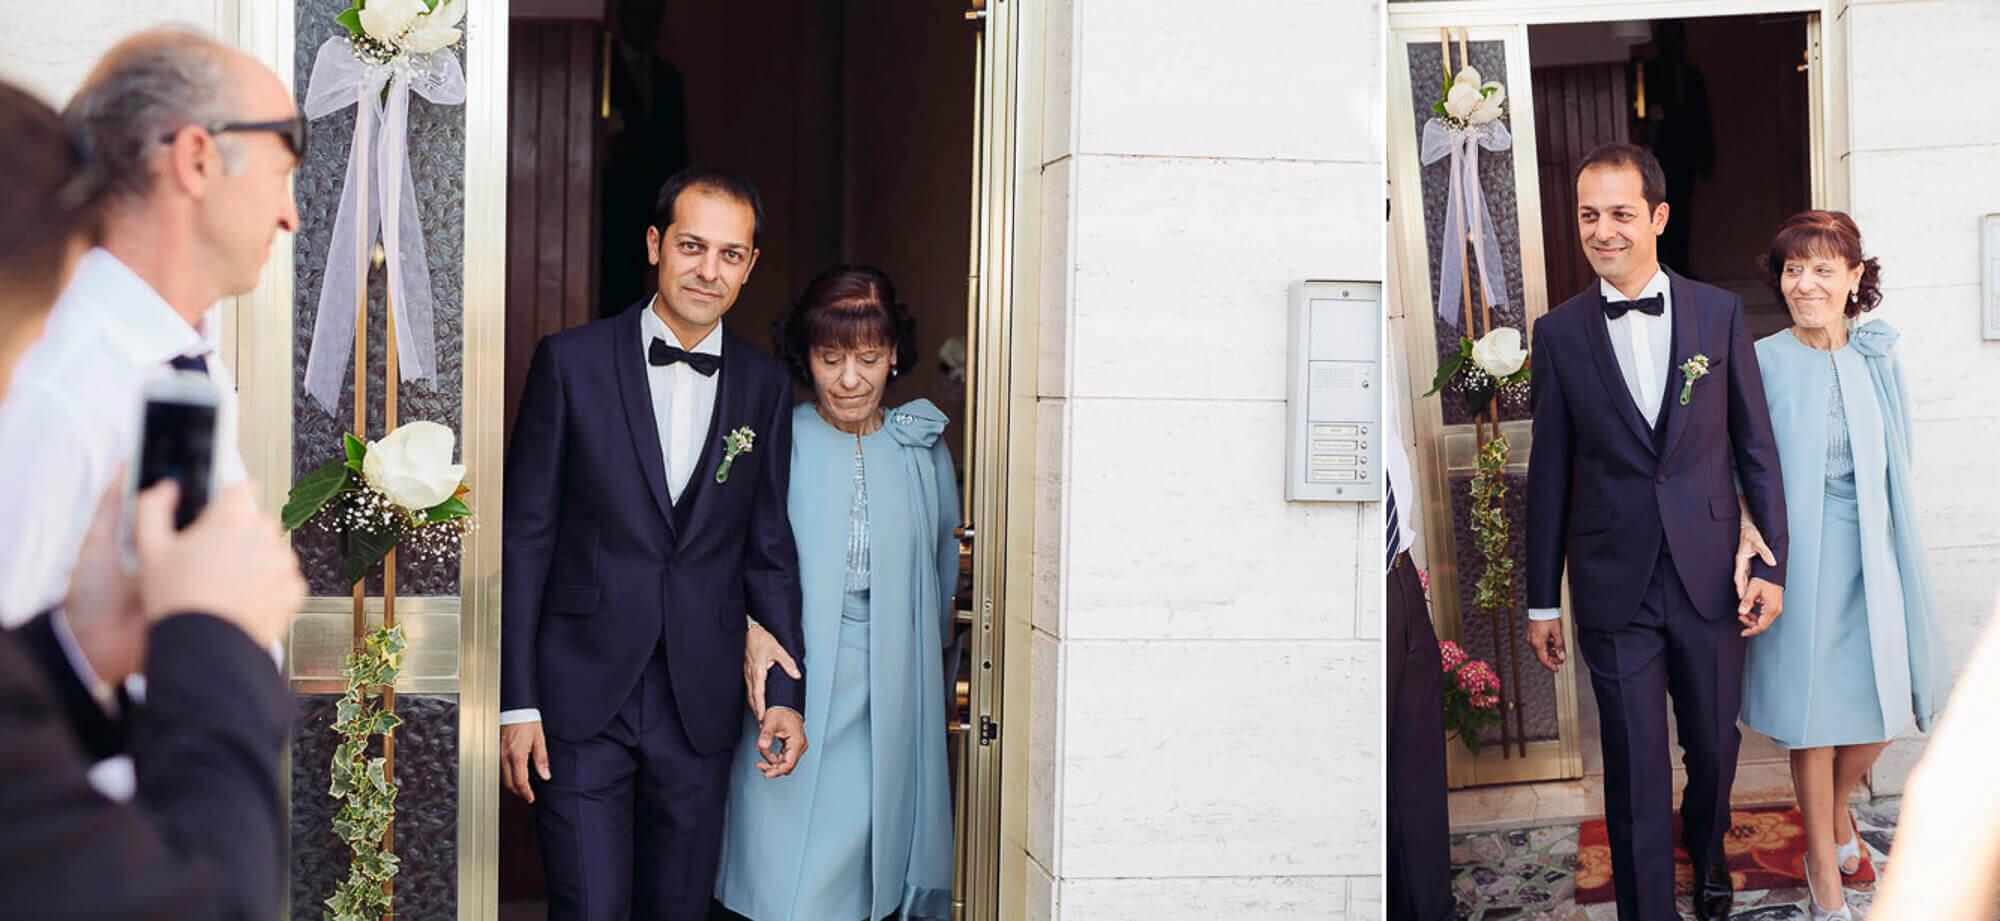 37_wedding_marche.jpg